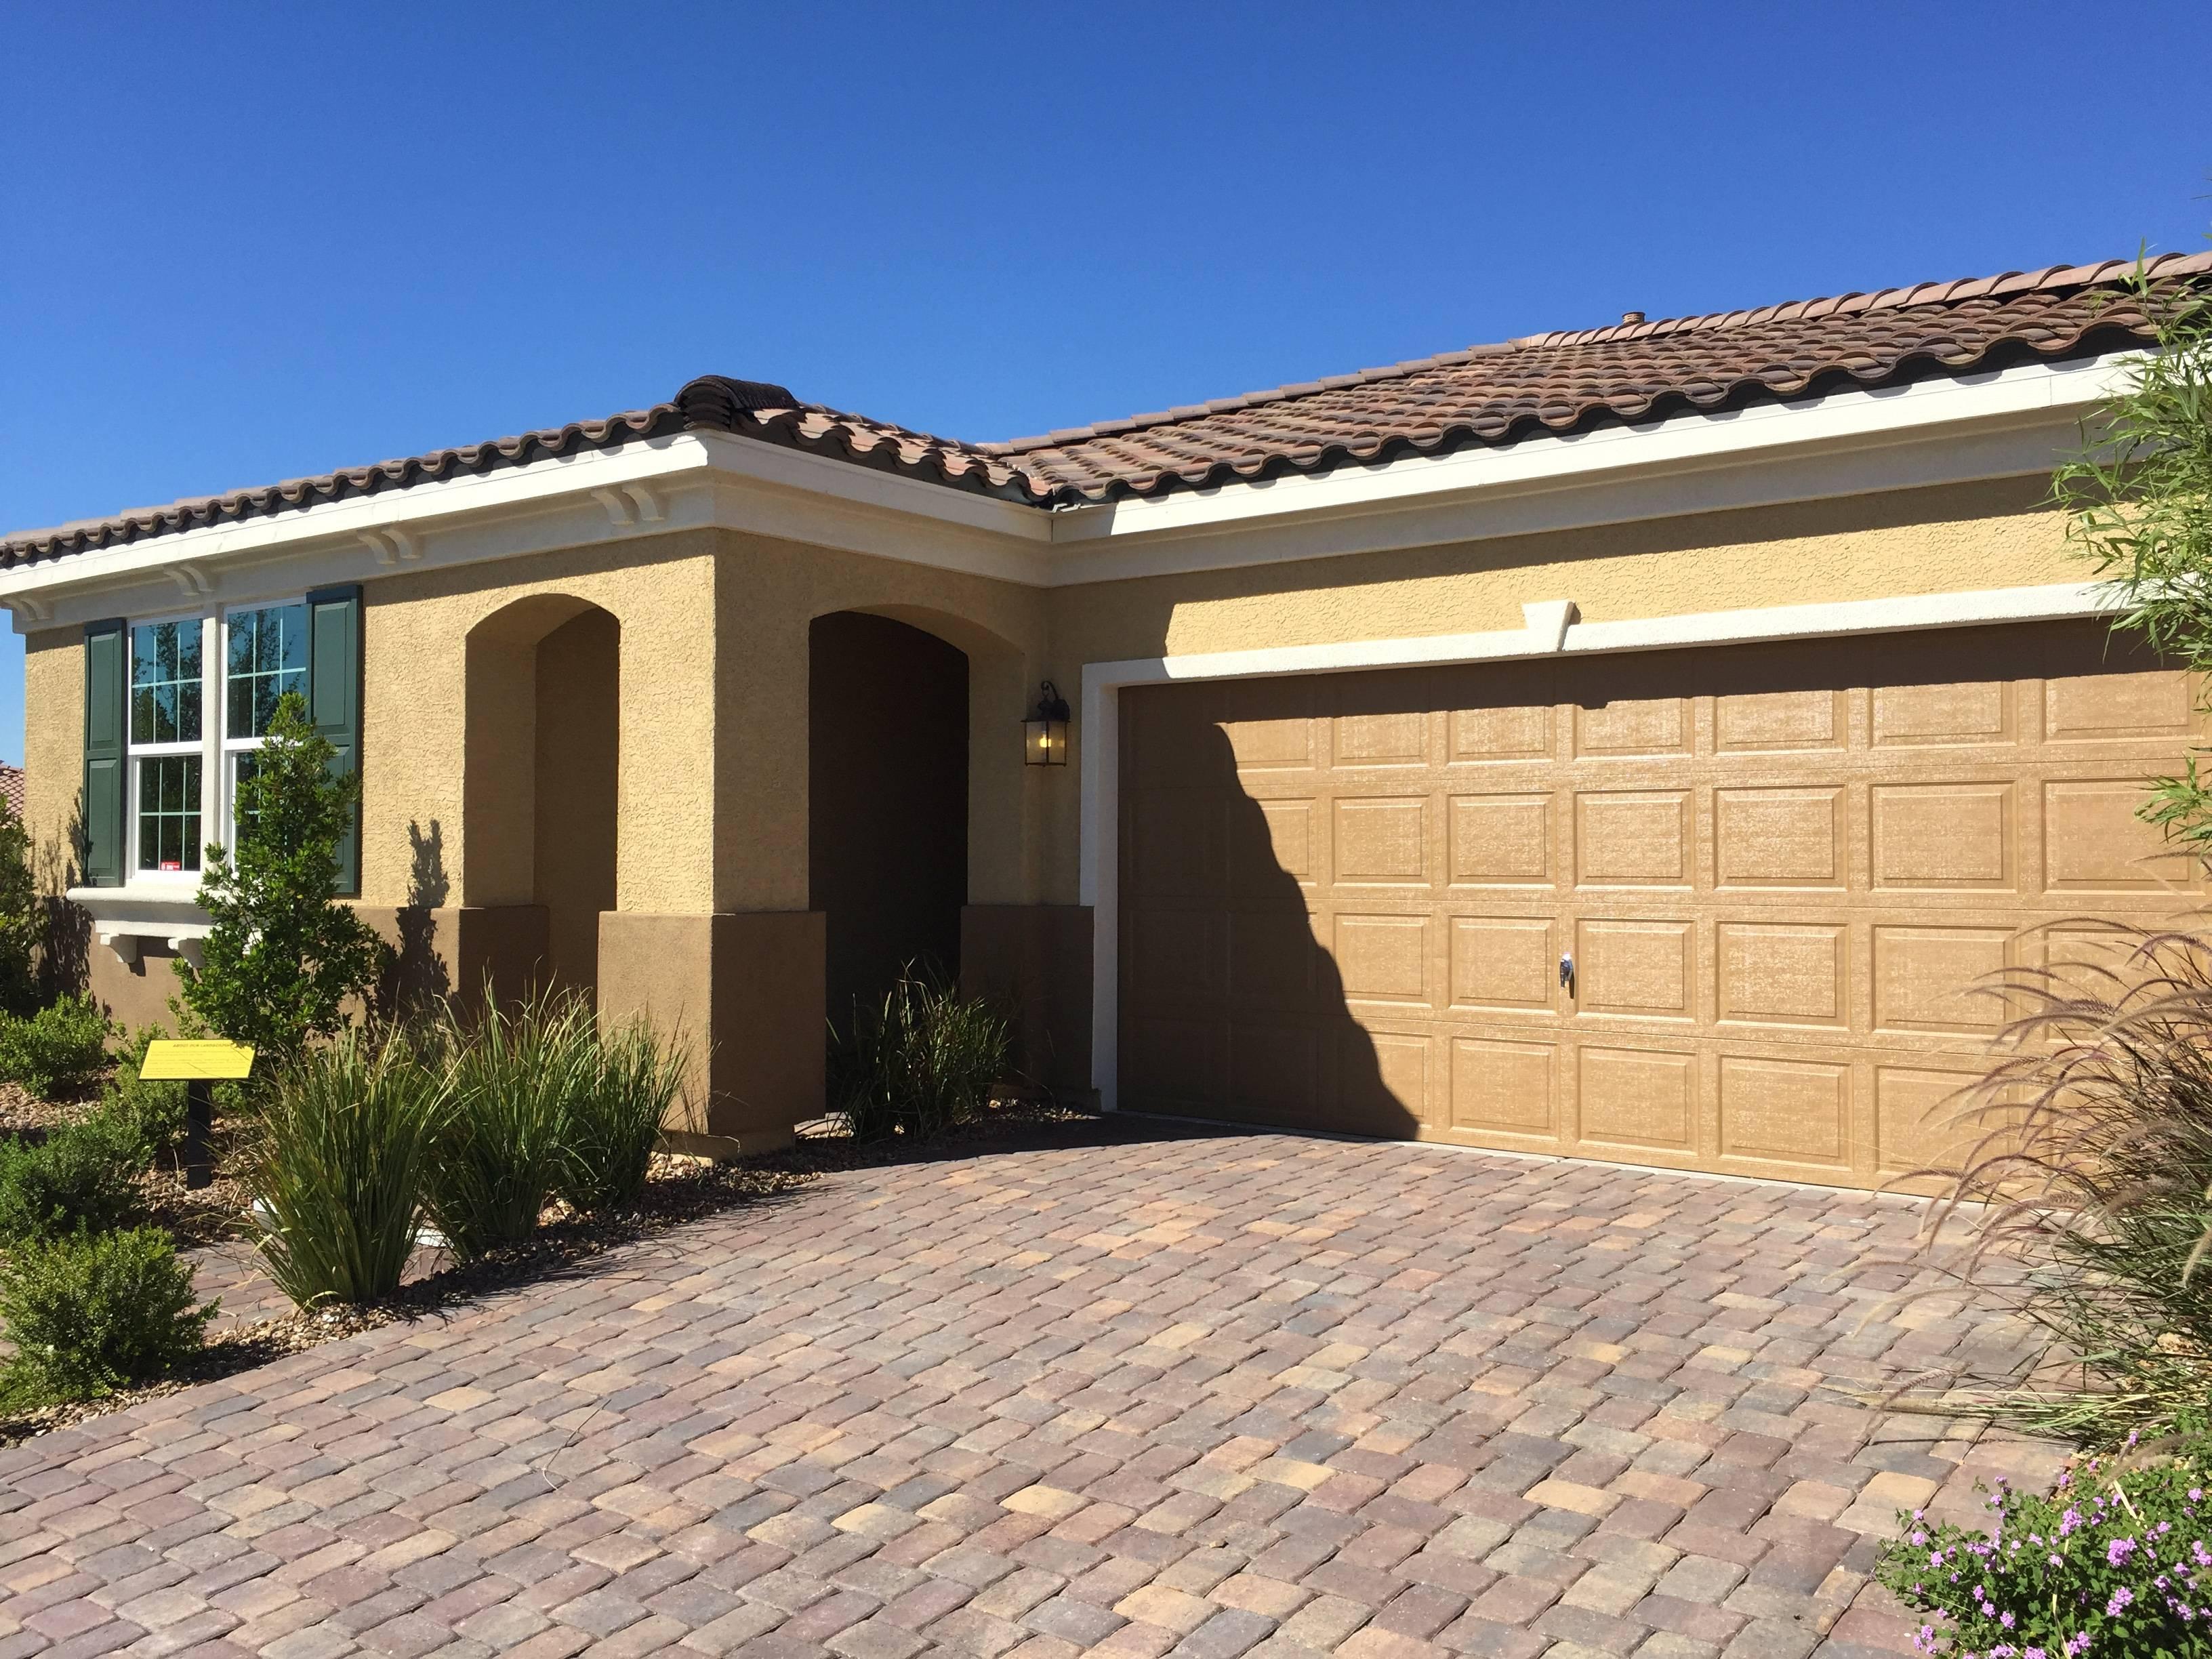 Inspirada In Henderson NV Offers Affordable Luxury Homes In Vegas. Contact  Lauren Stark 702